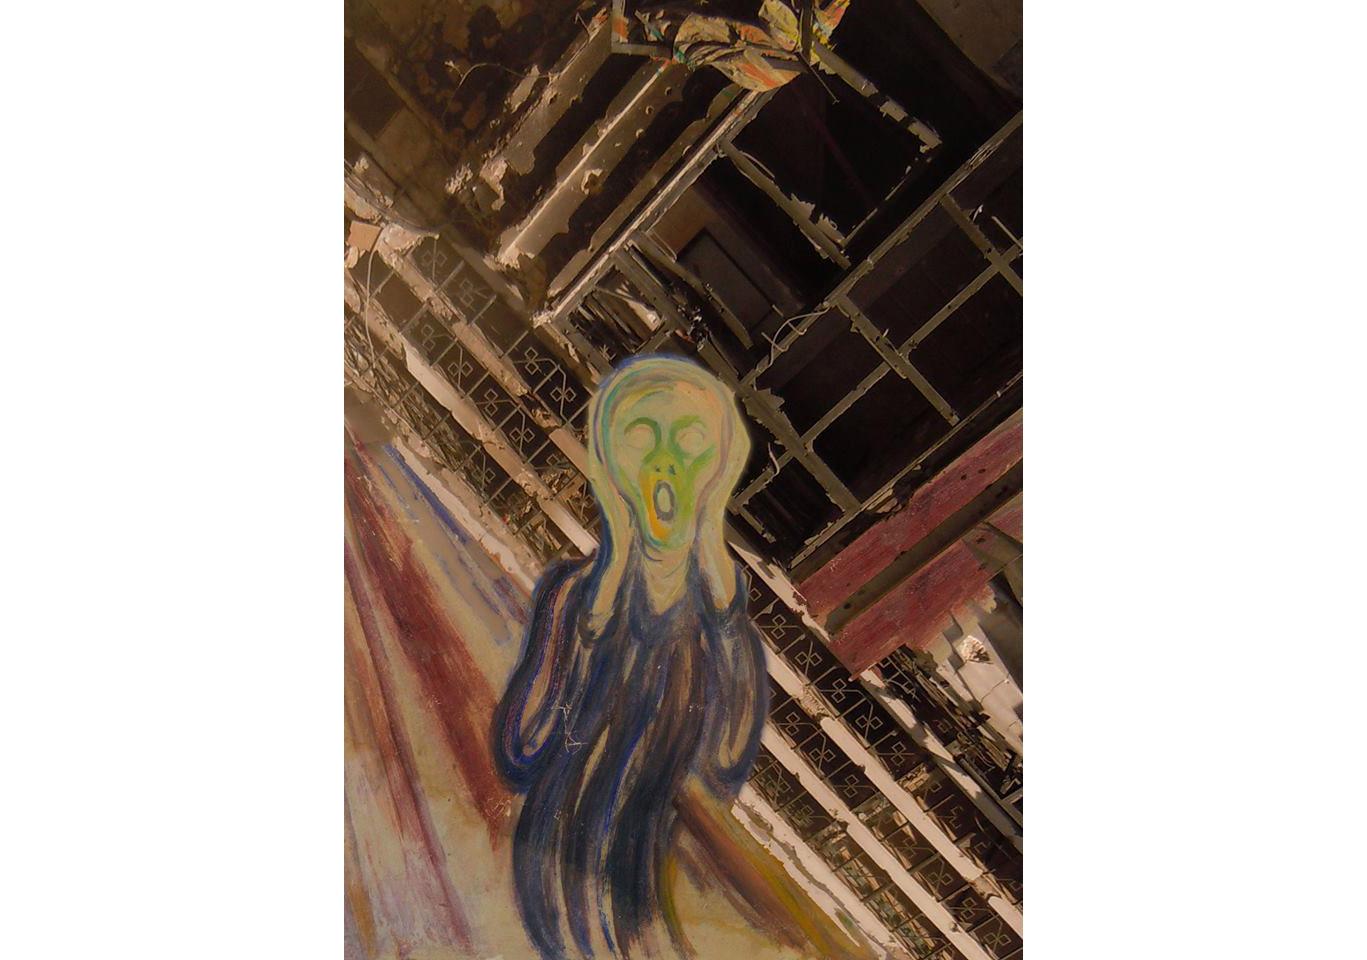 Tammam Azzam, Edvard Munch's The Scream, 2012, archival print on canvas 100 x 70 cm